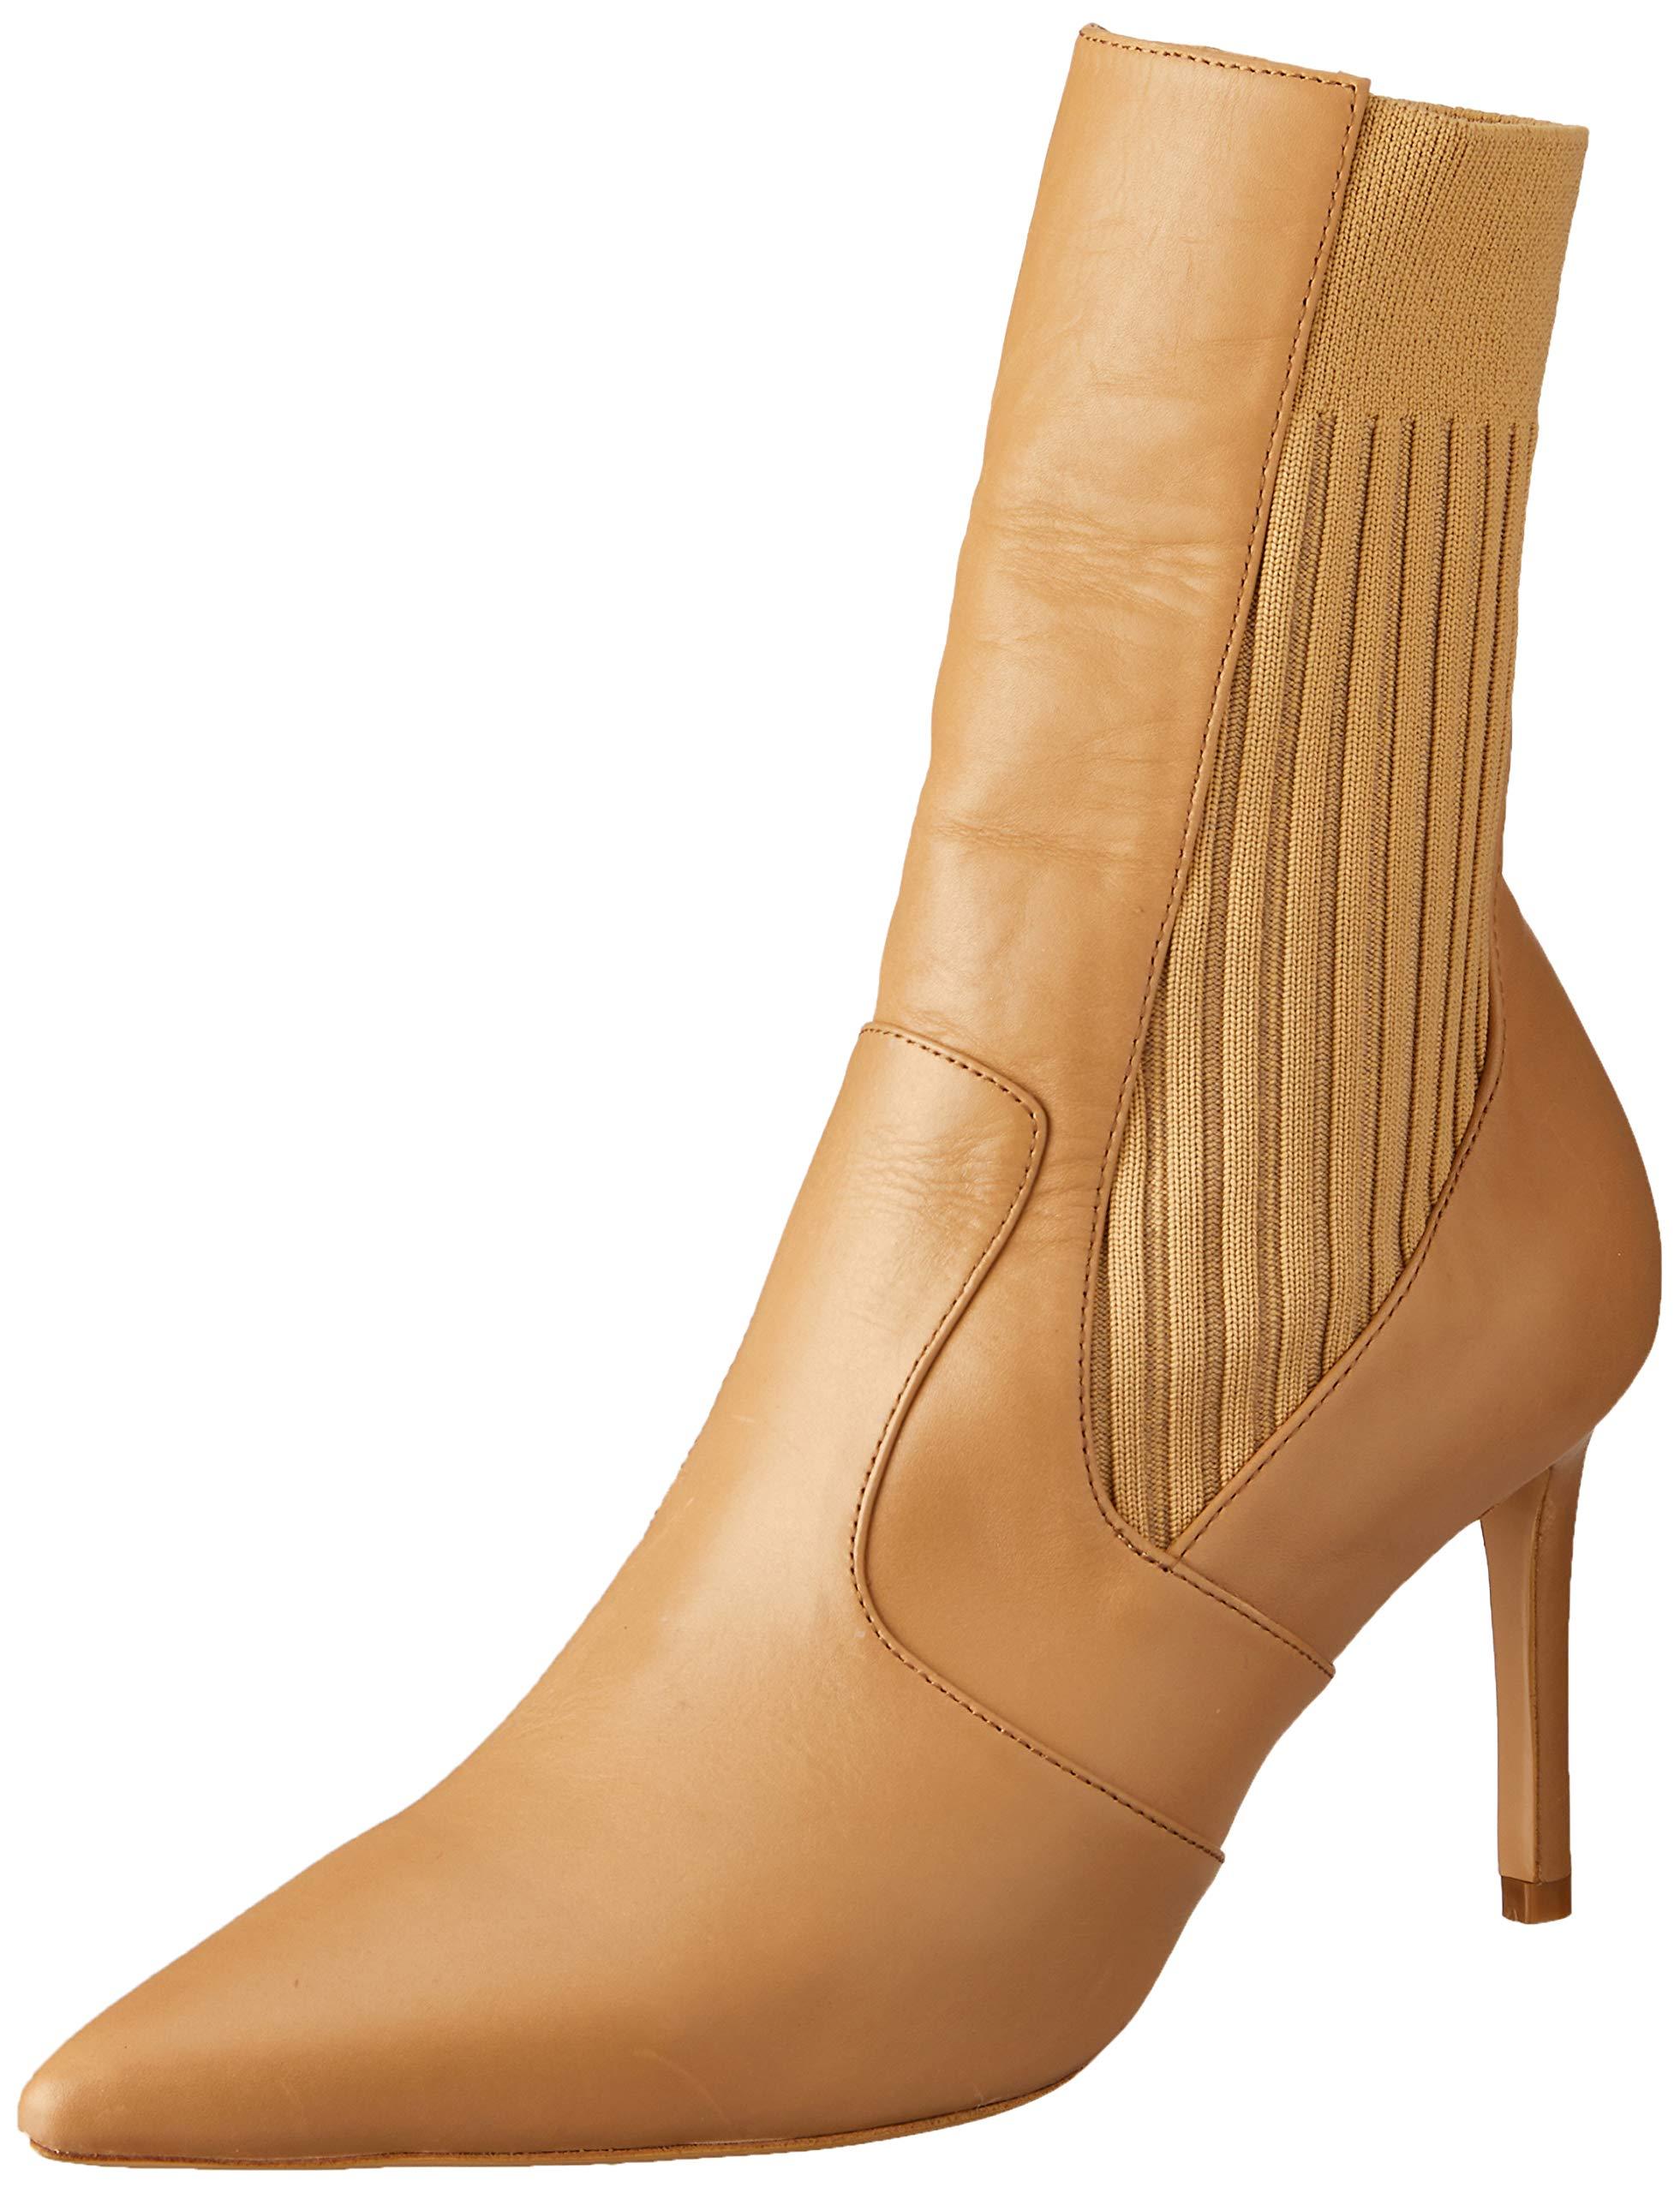 Tony Bianco boot